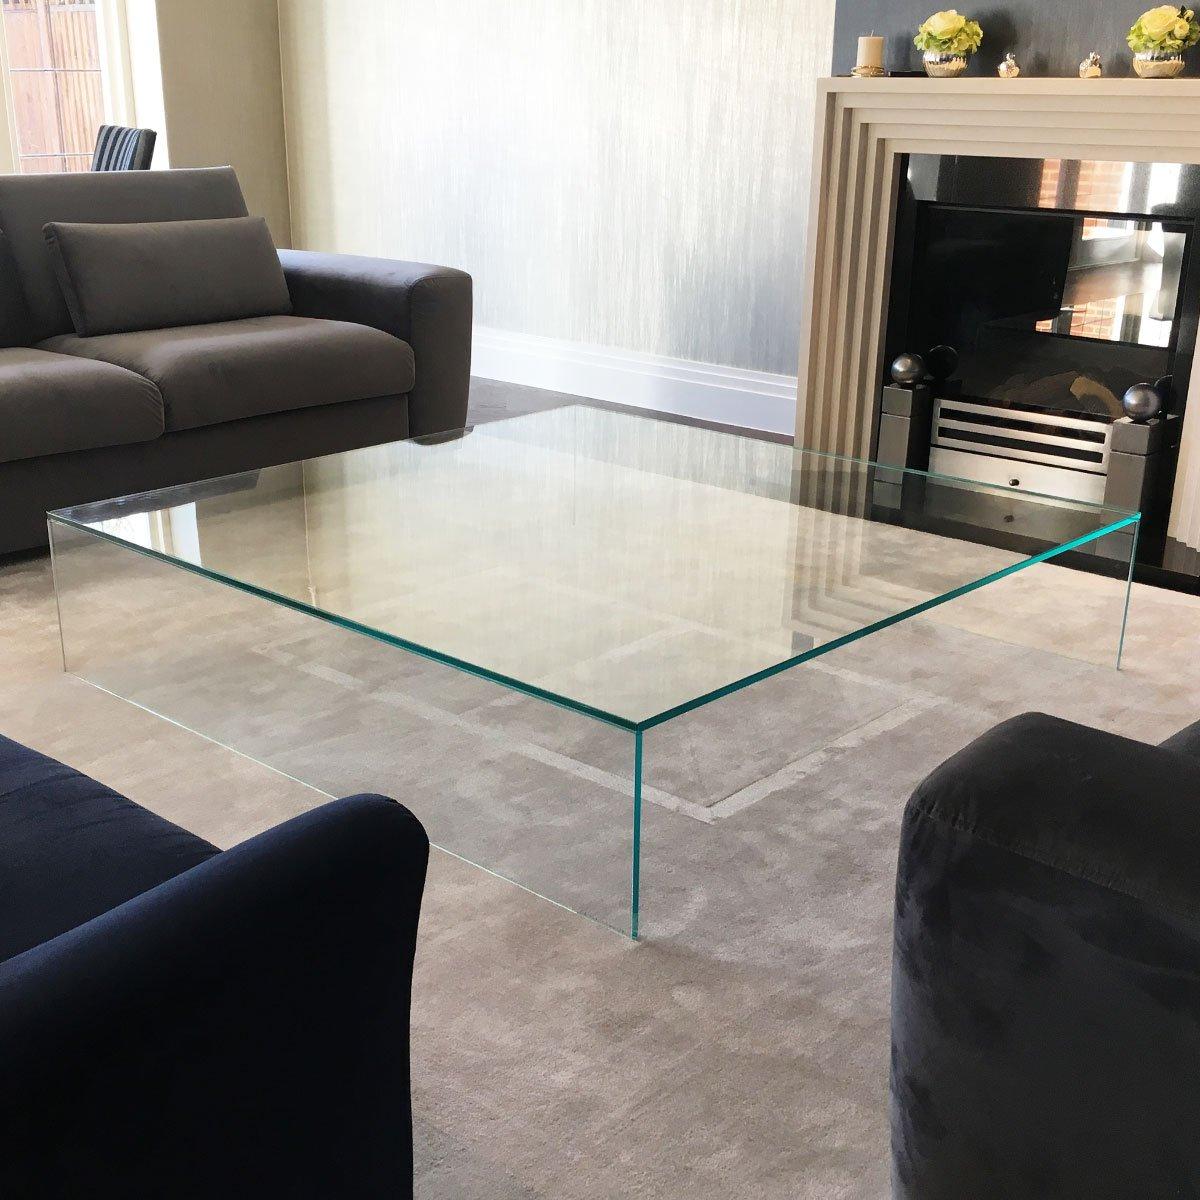 Judd Large Glass Coffee Table Klarity Glass Furniture